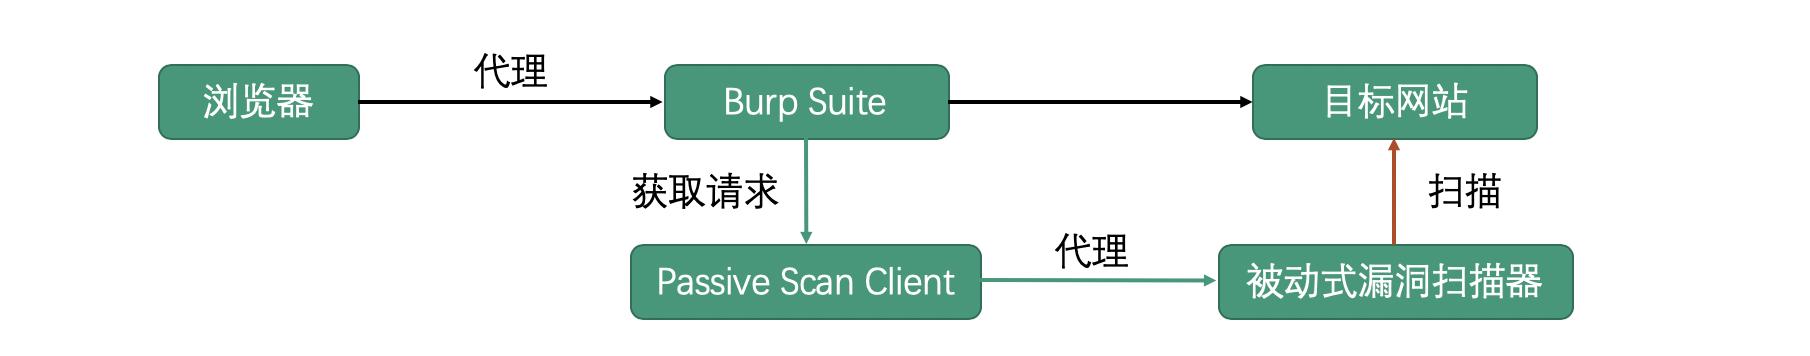 Burpsuite被动扫描流量转发插件:Passive Scan Client